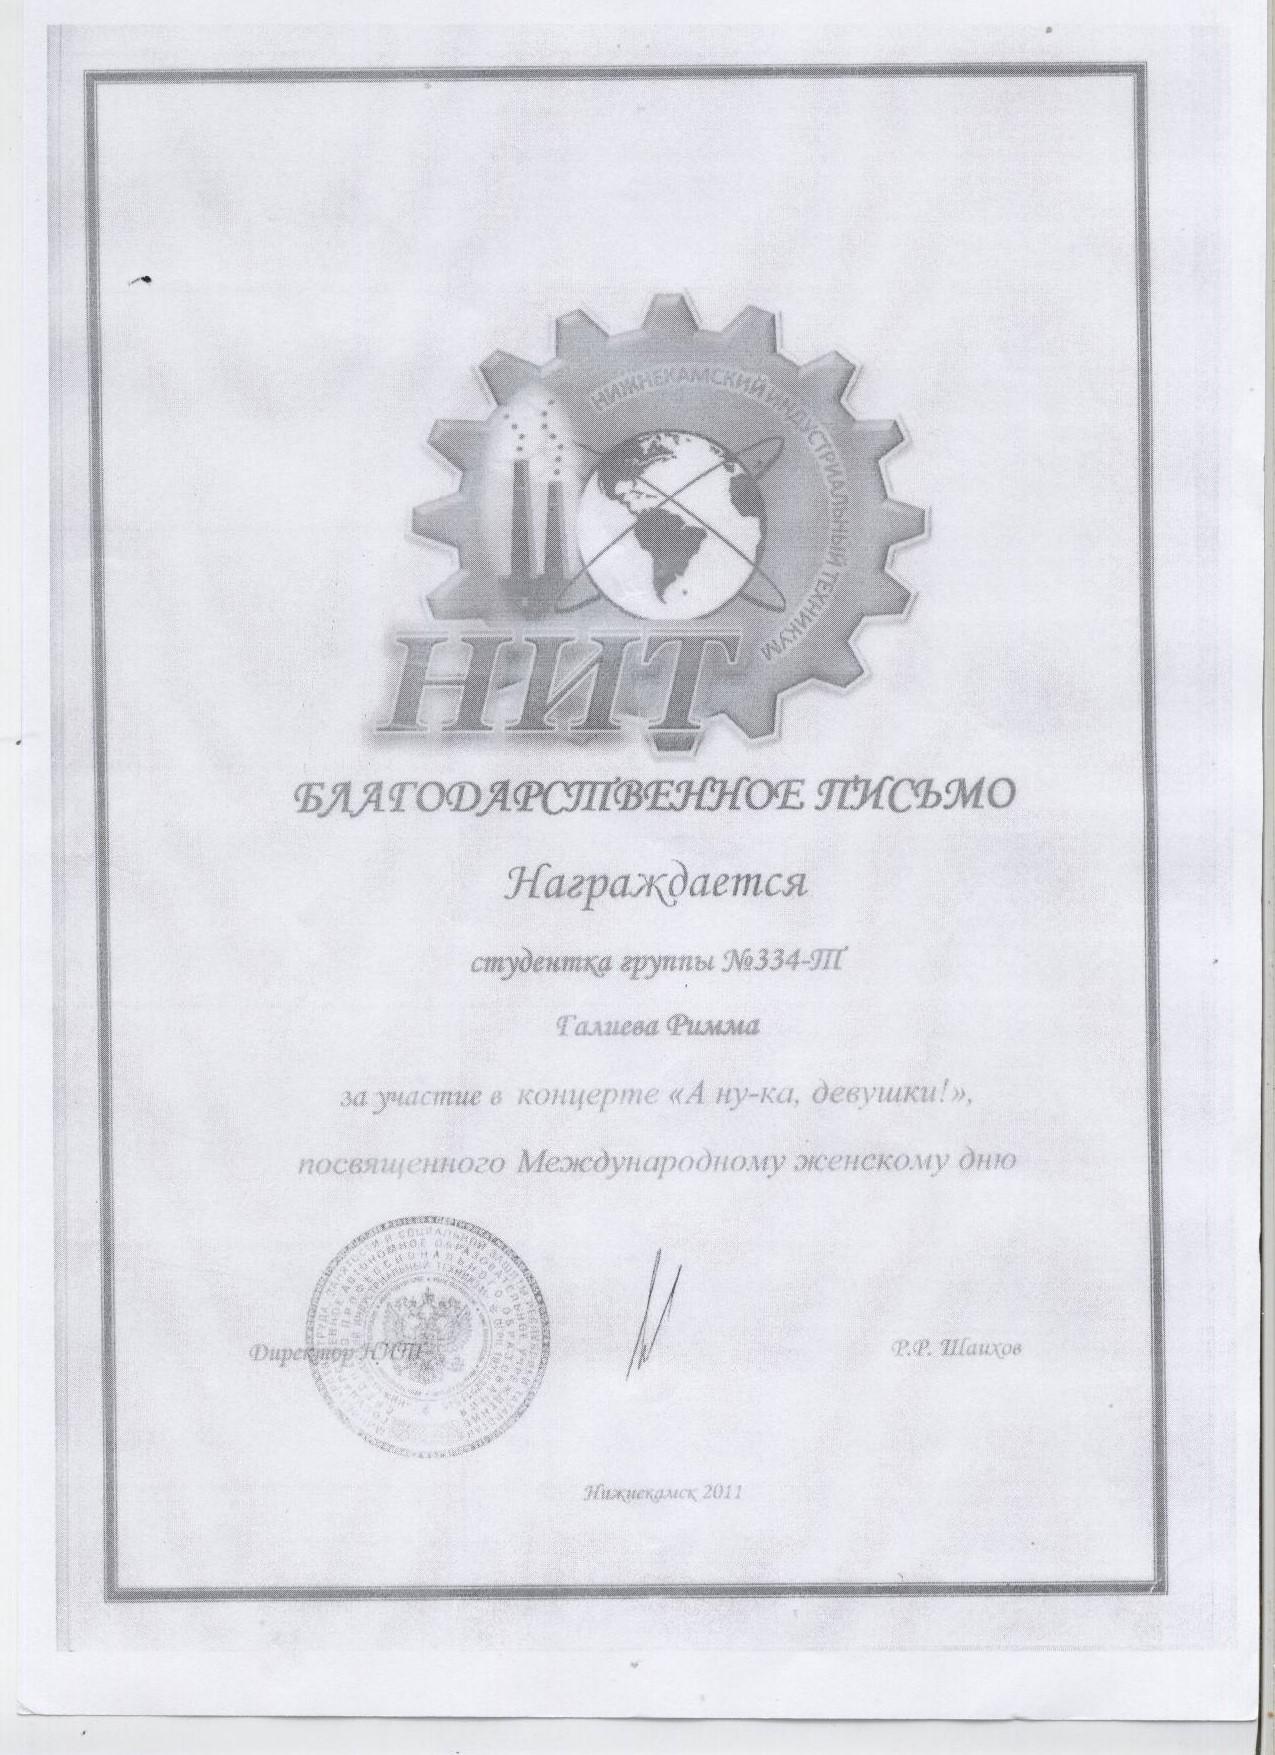 F:\Всероссйский конкурс Портфолио выпускника\РИММА\Римма 007.jpg